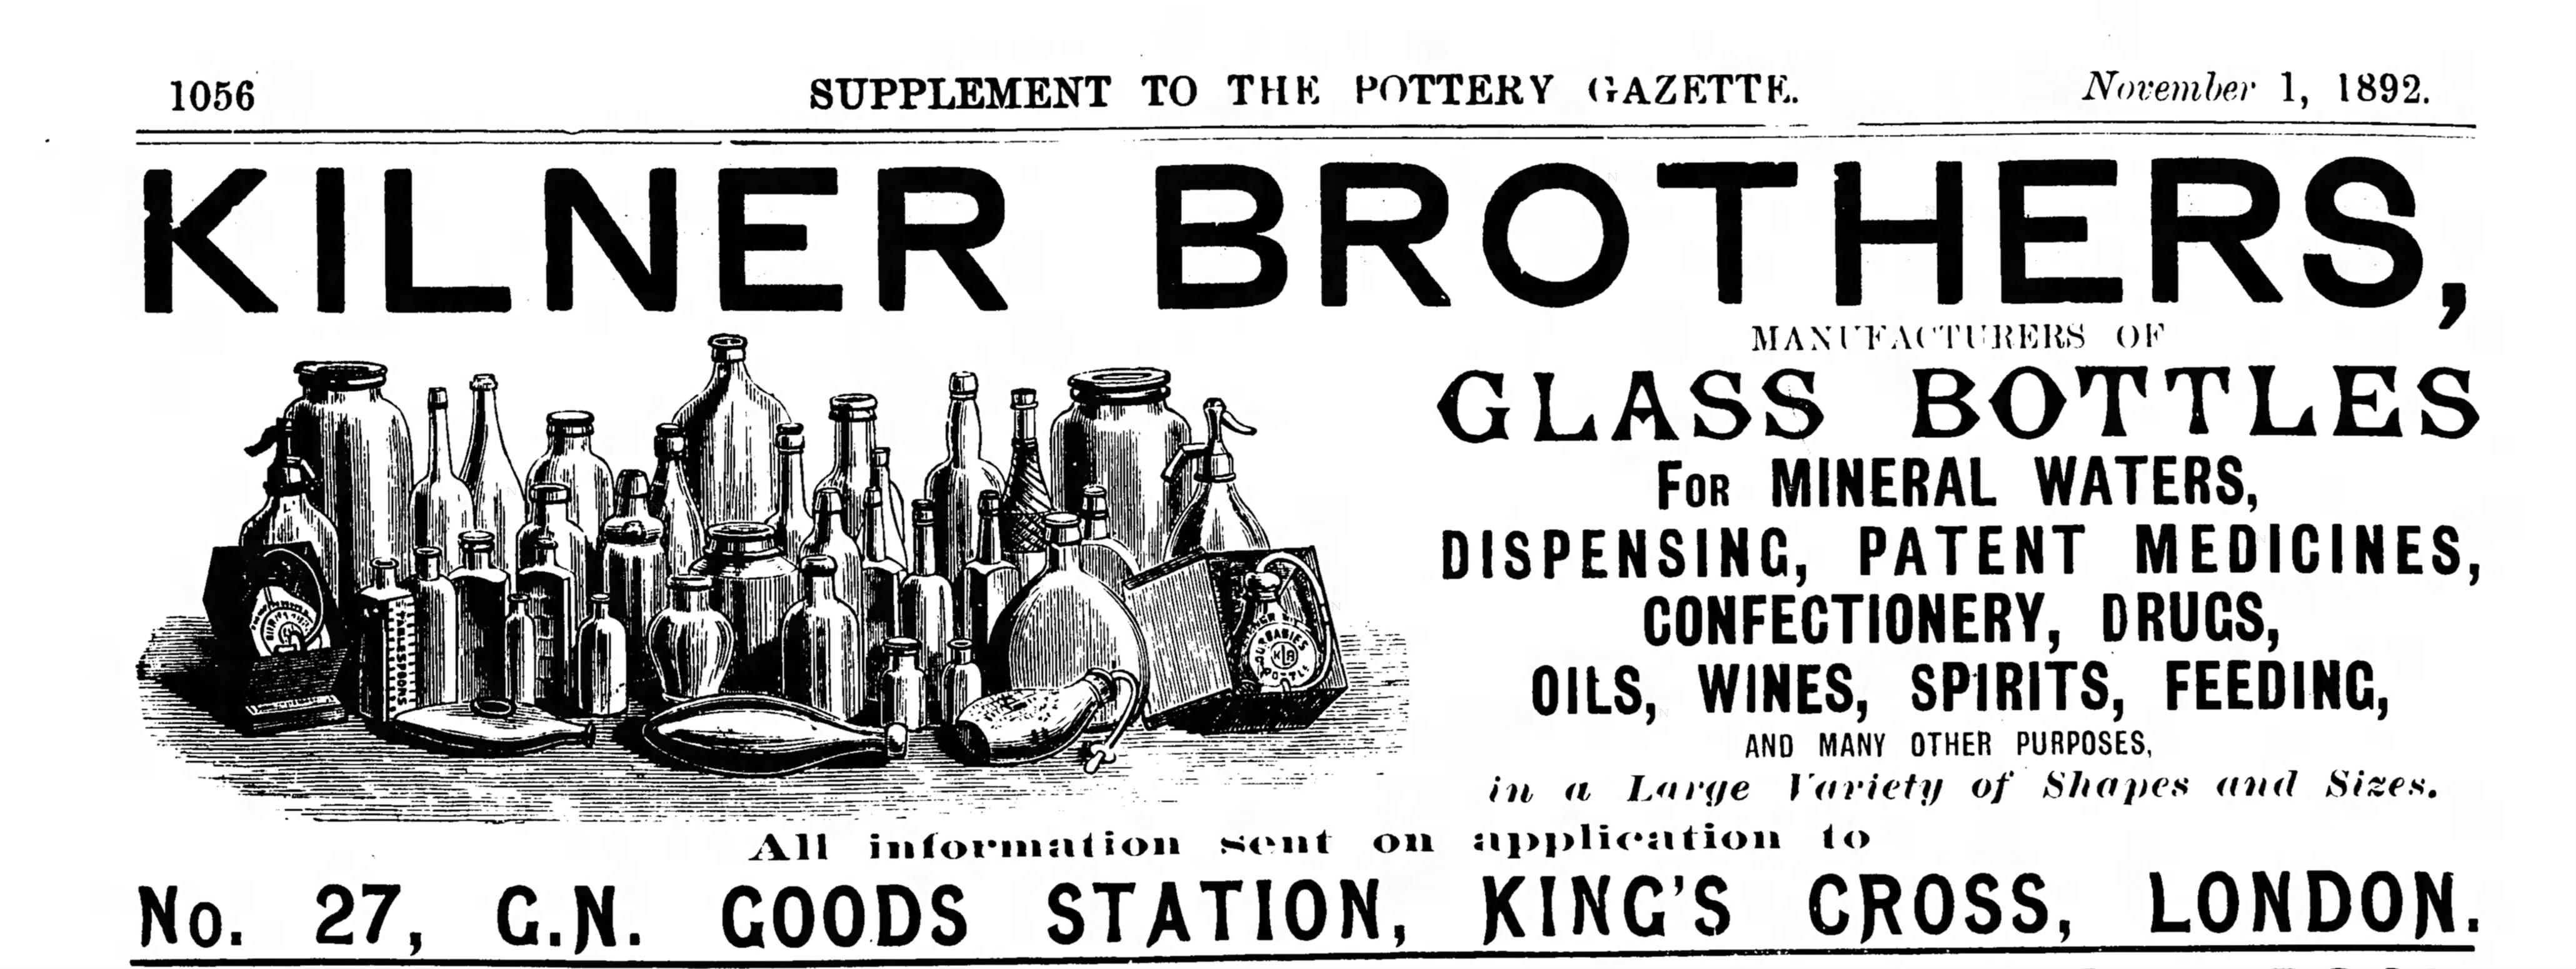 Kilner Brothers_The_Pottery_Gazette_London, England_Tue__Nov_1__1892.jpg